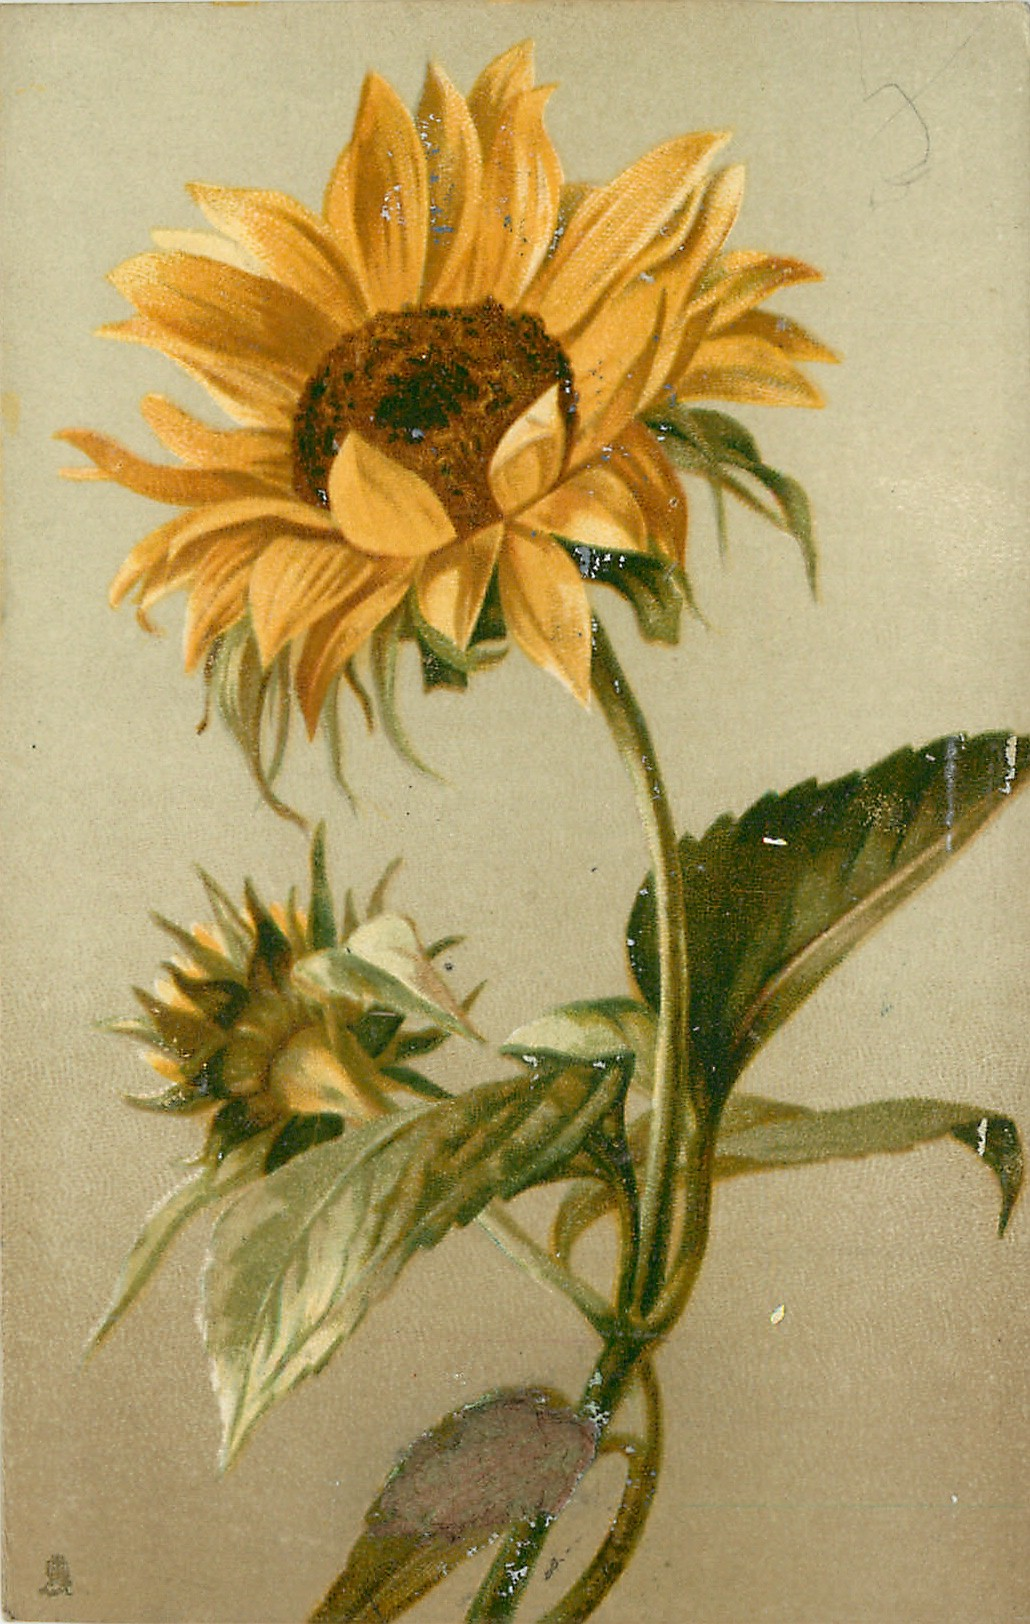 One Open Sunflower With Stem Curving Slight Left Bud